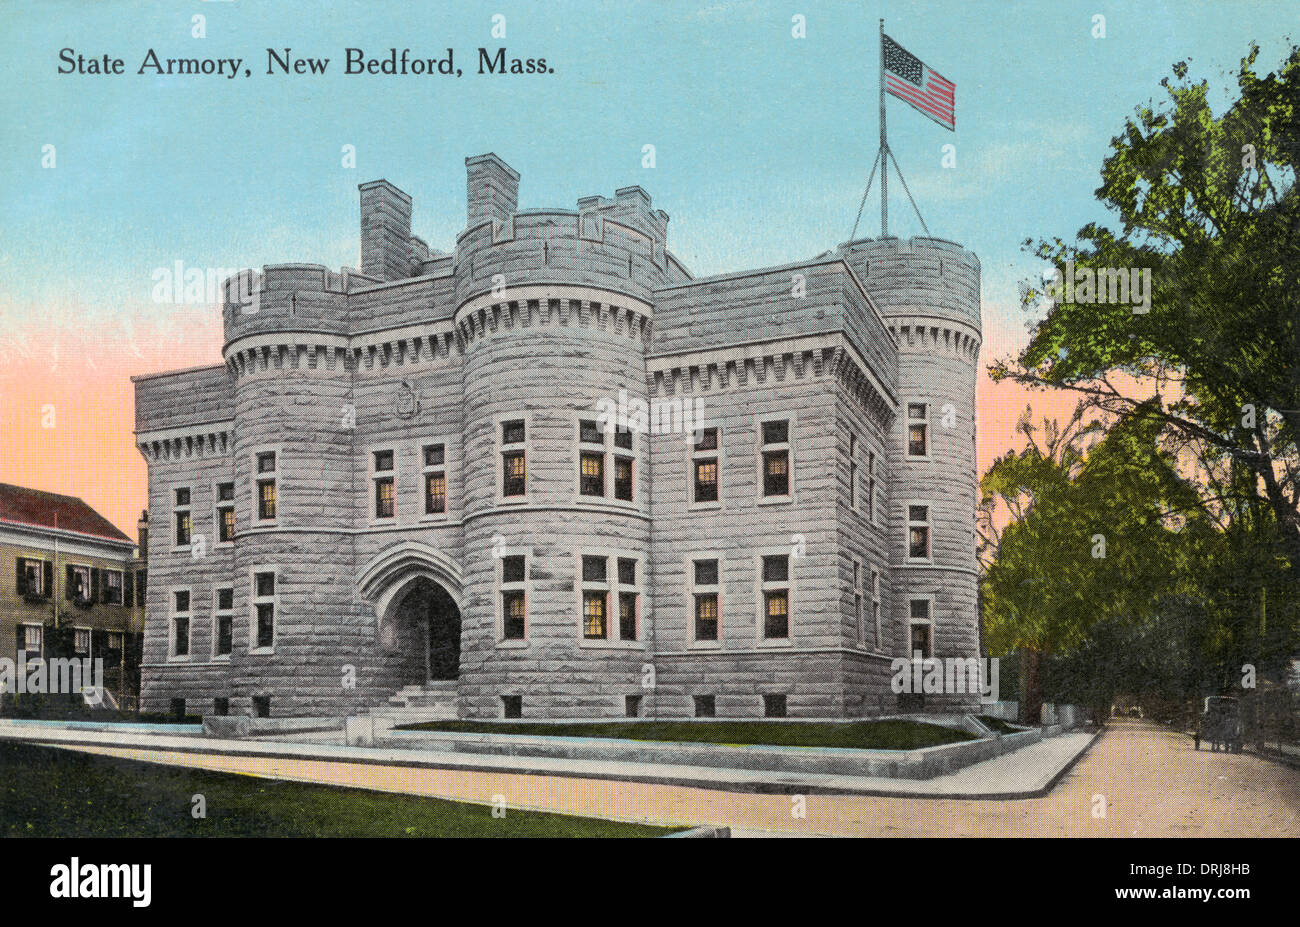 State Armoury, New Bedford, Massachusetts, USA - Stock Image